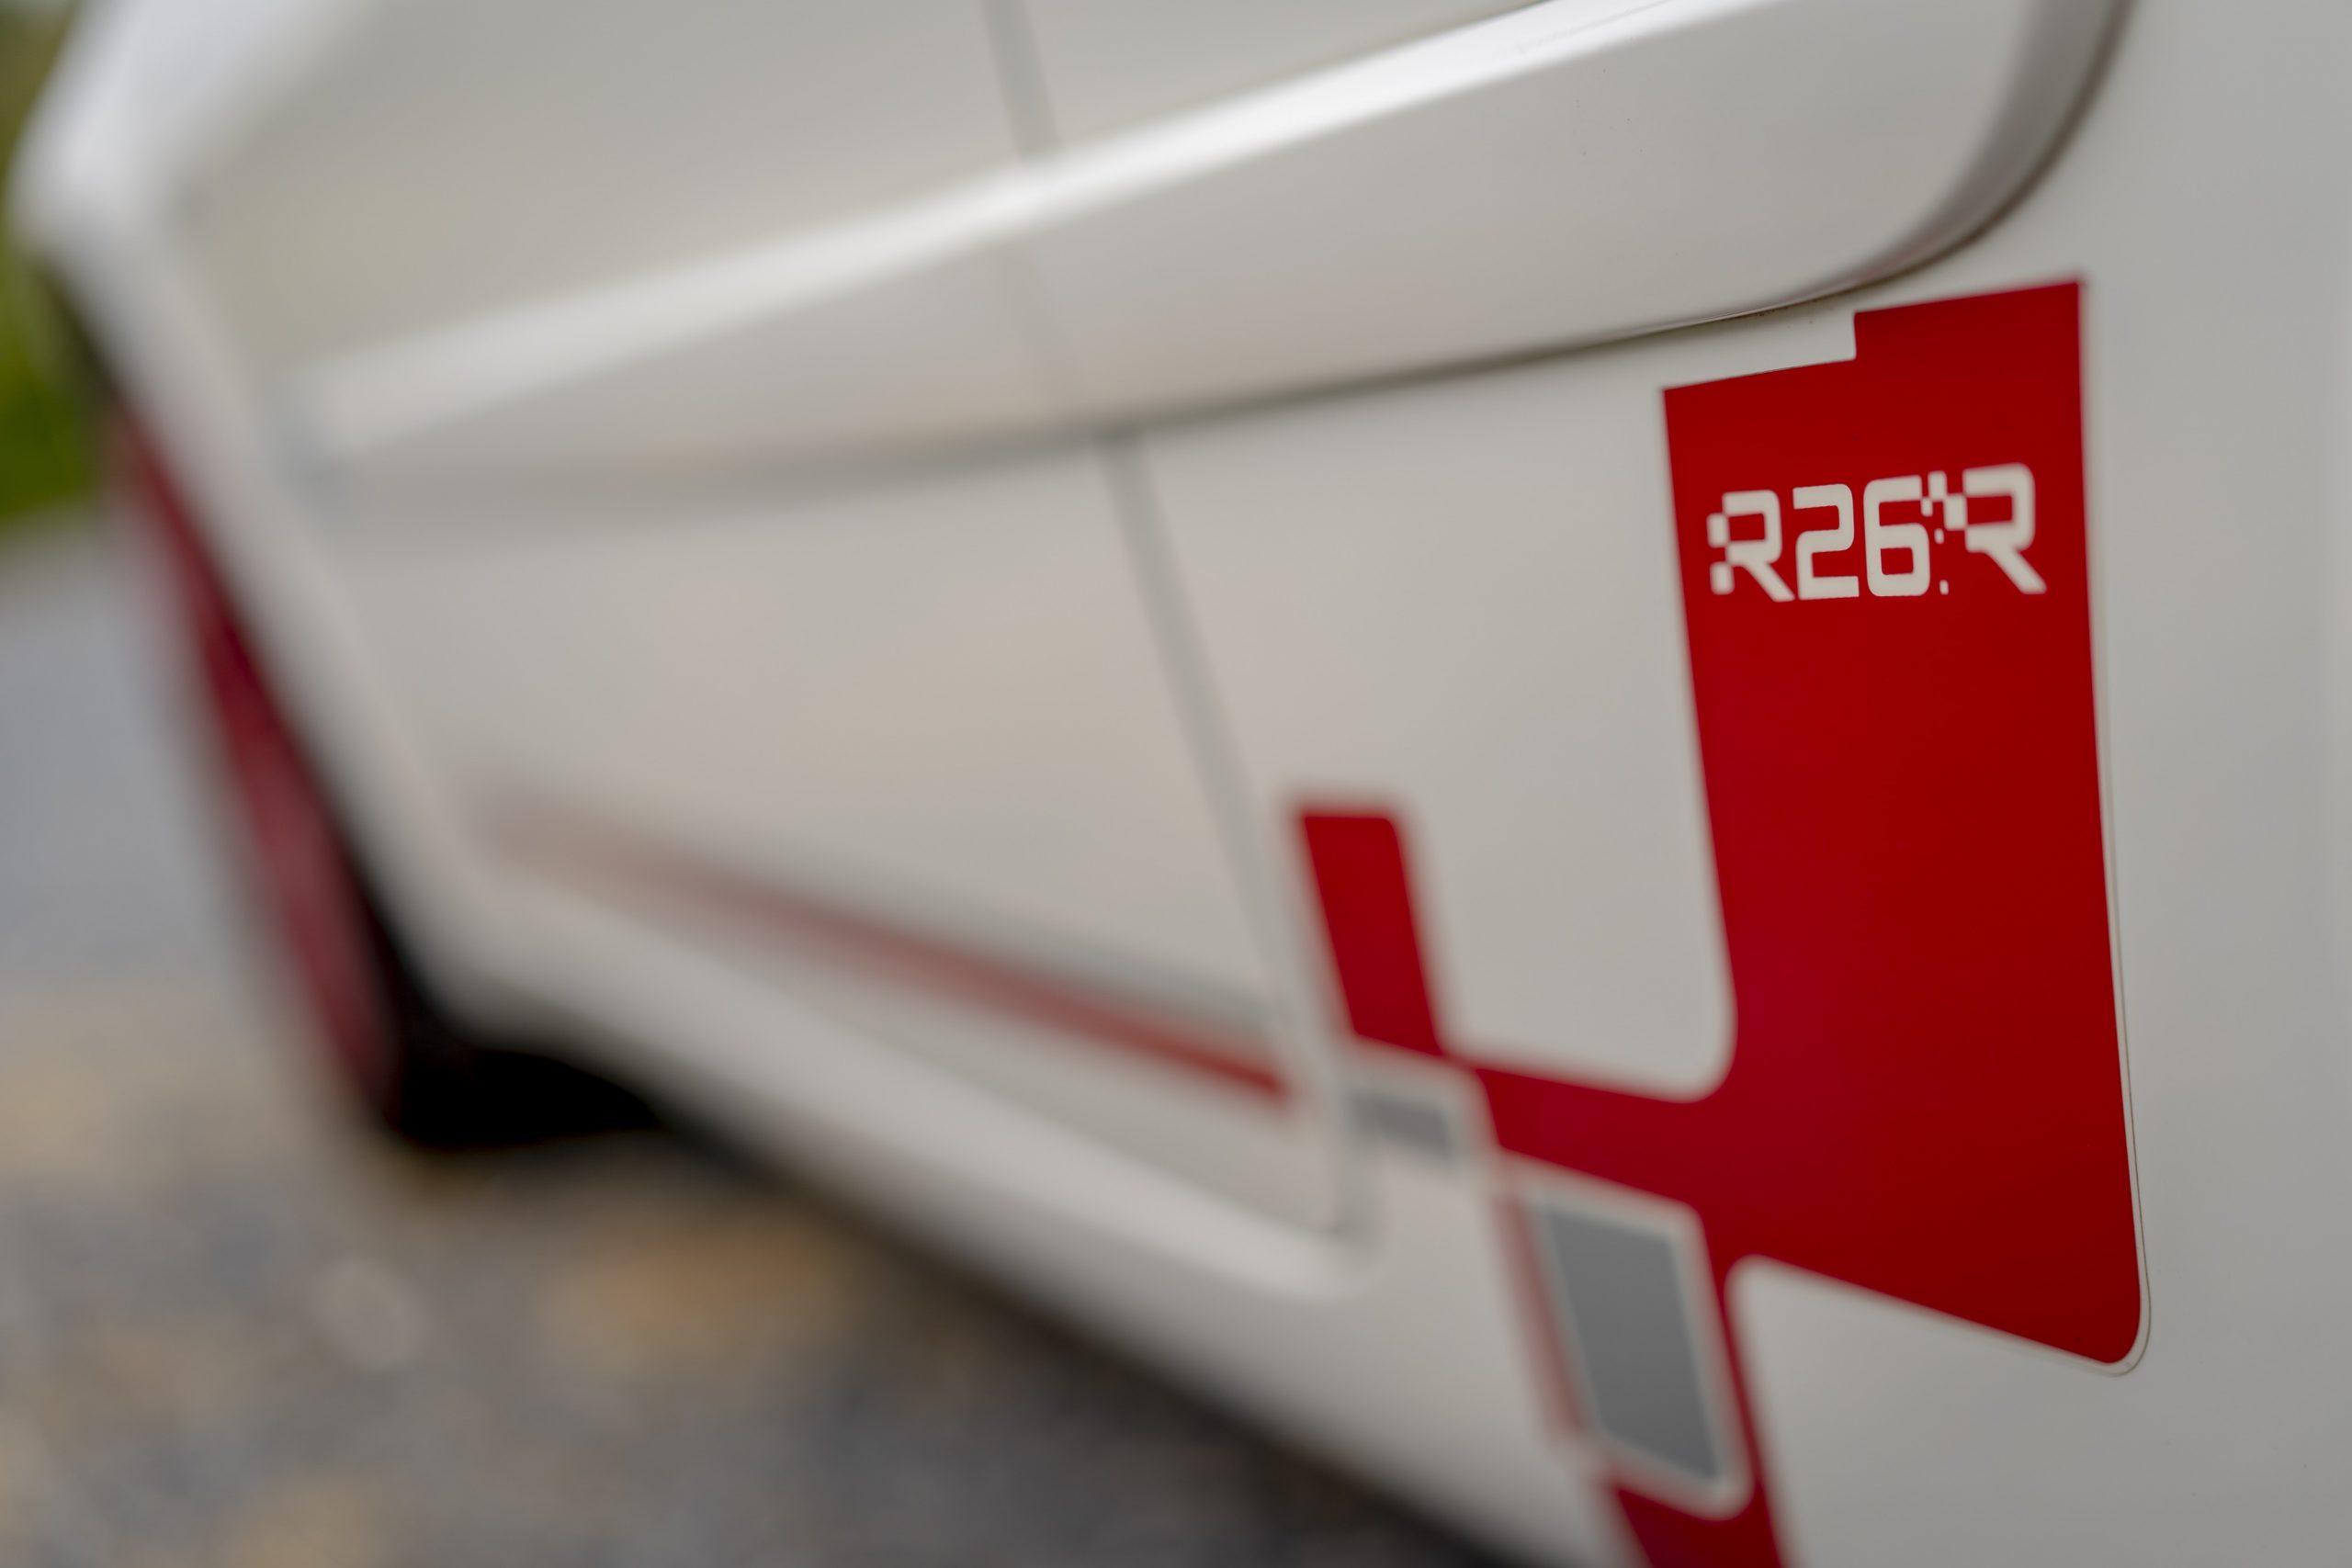 Renault Megane R26R graphic